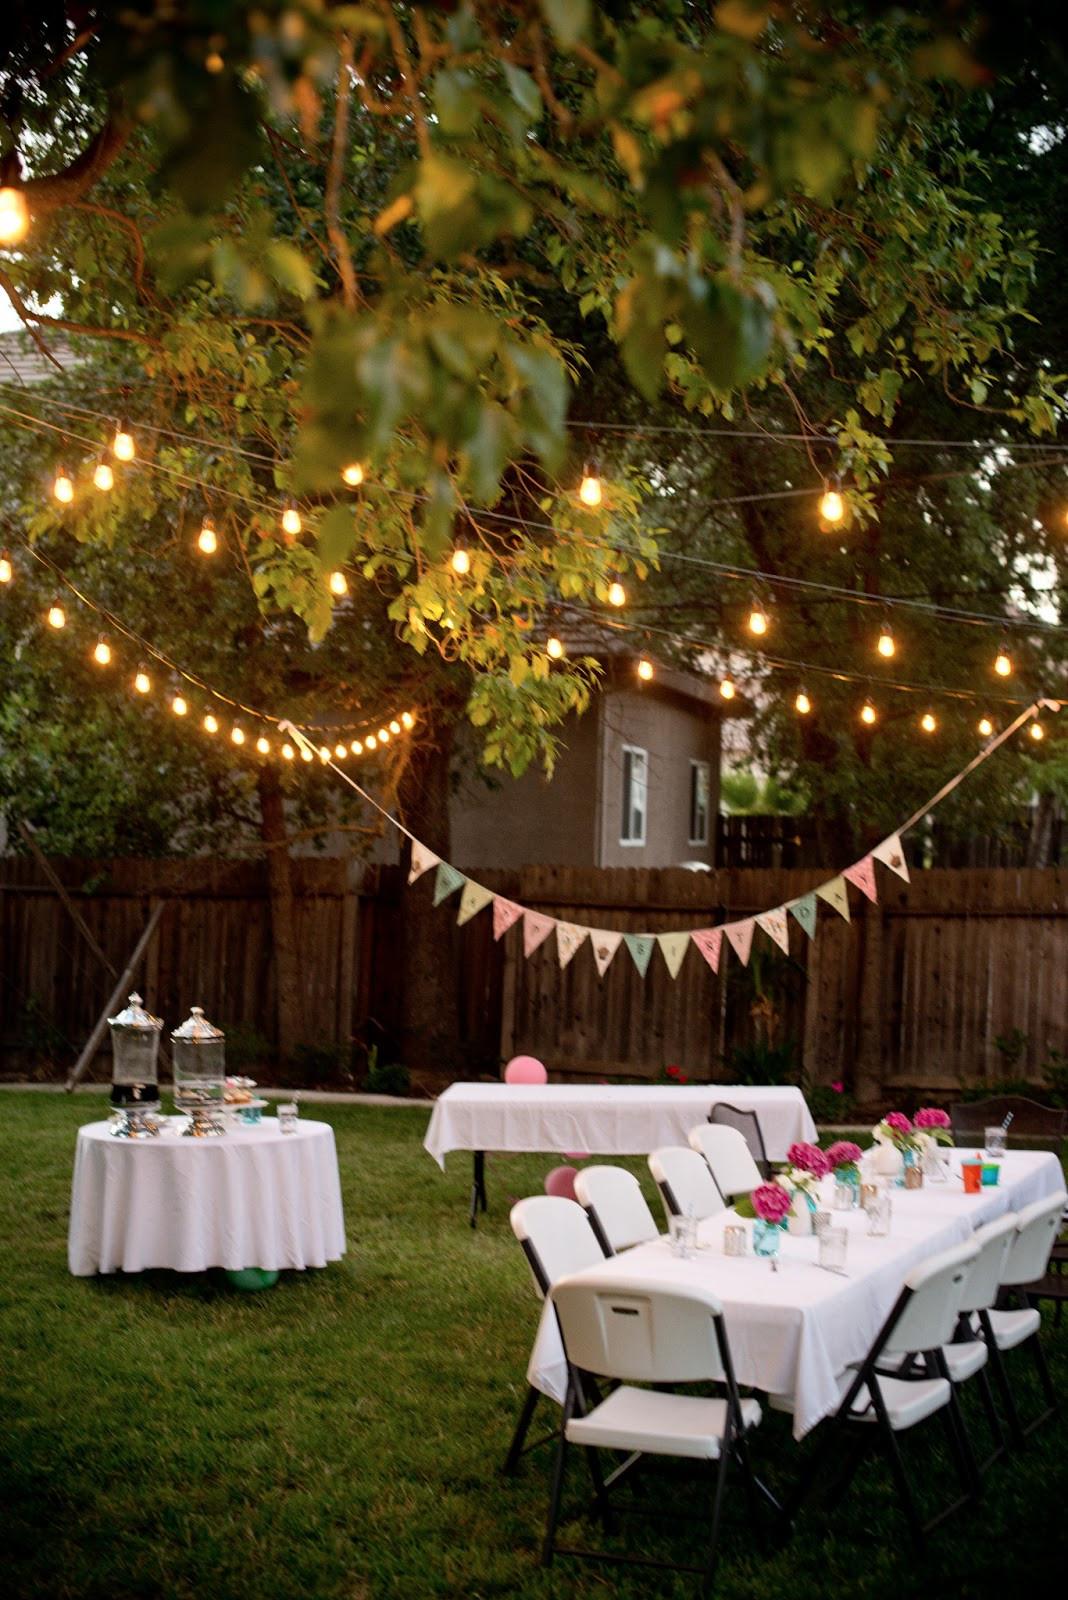 Catering Ideas For Backyard Party  Domestic Fashionista Backyard Birthday Fun Pink